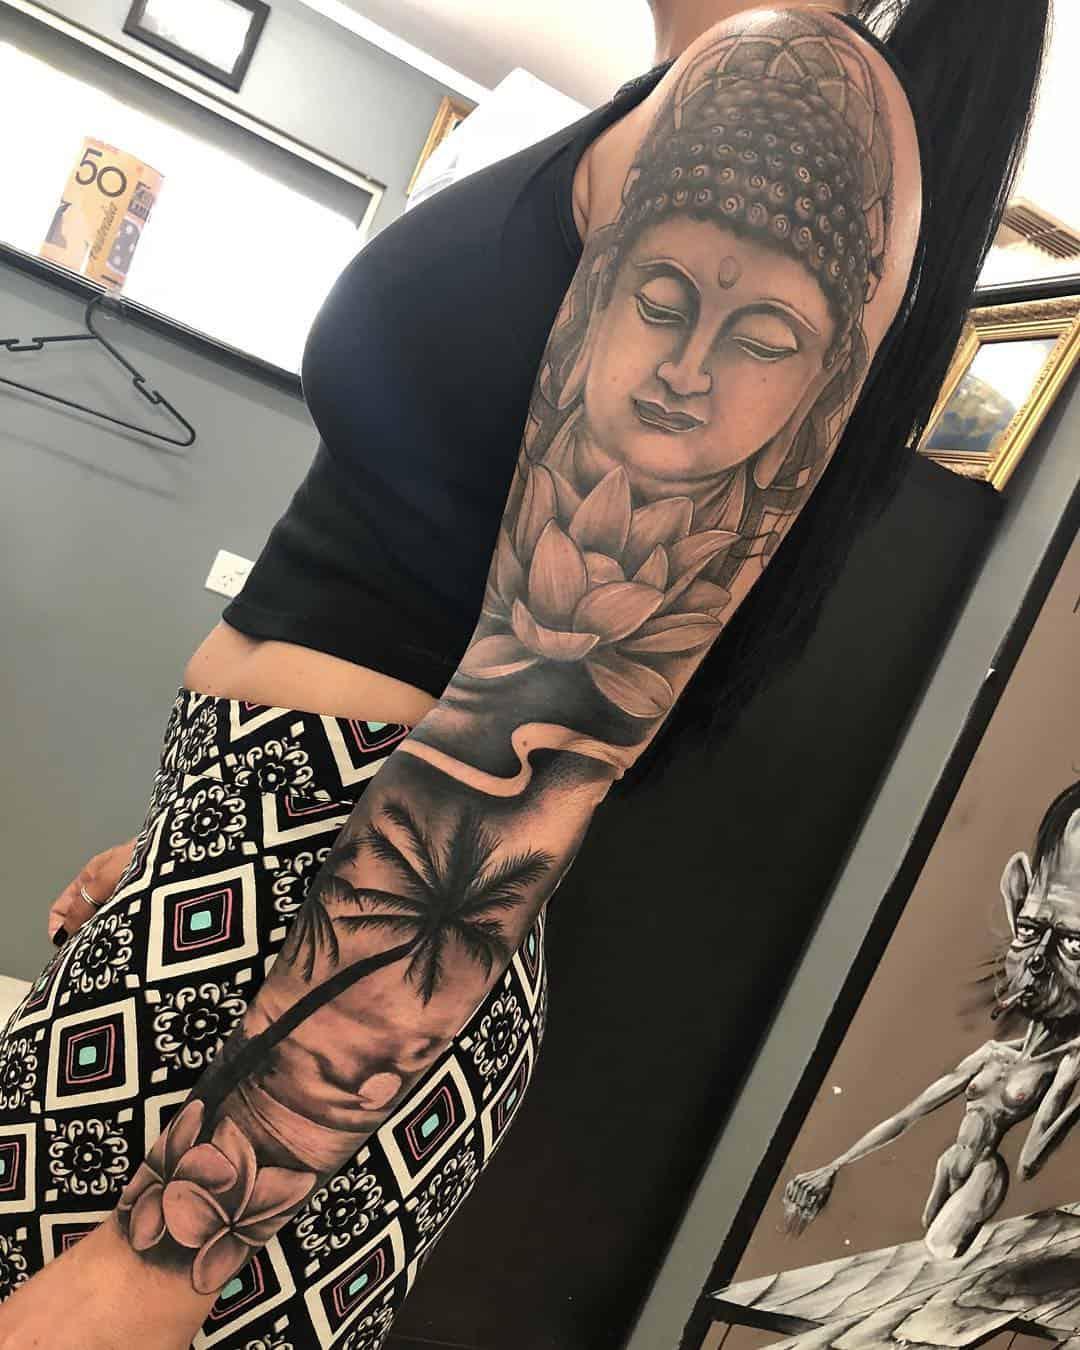 Tattoo by @abbiepriceart